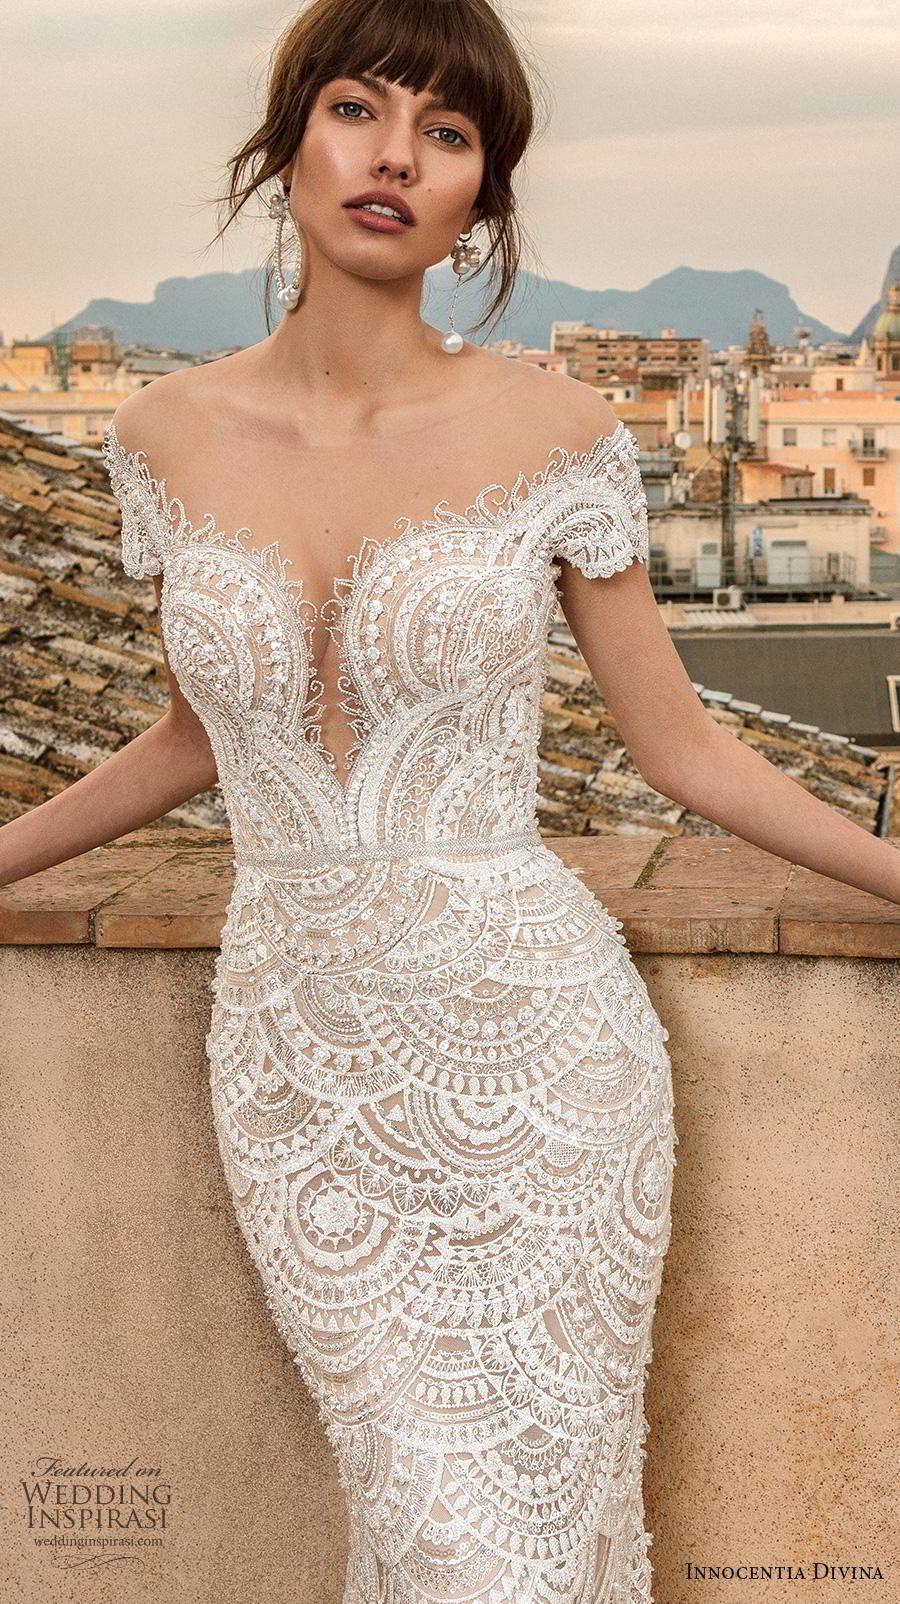 Innocentia Divina 2020 Wedding Dresses Sicilia Bridal Collection Wedding Inspirasi Short Wedding Dress Wedding Dress Inspiration 2020 Wedding Dresses [ 1604 x 900 Pixel ]